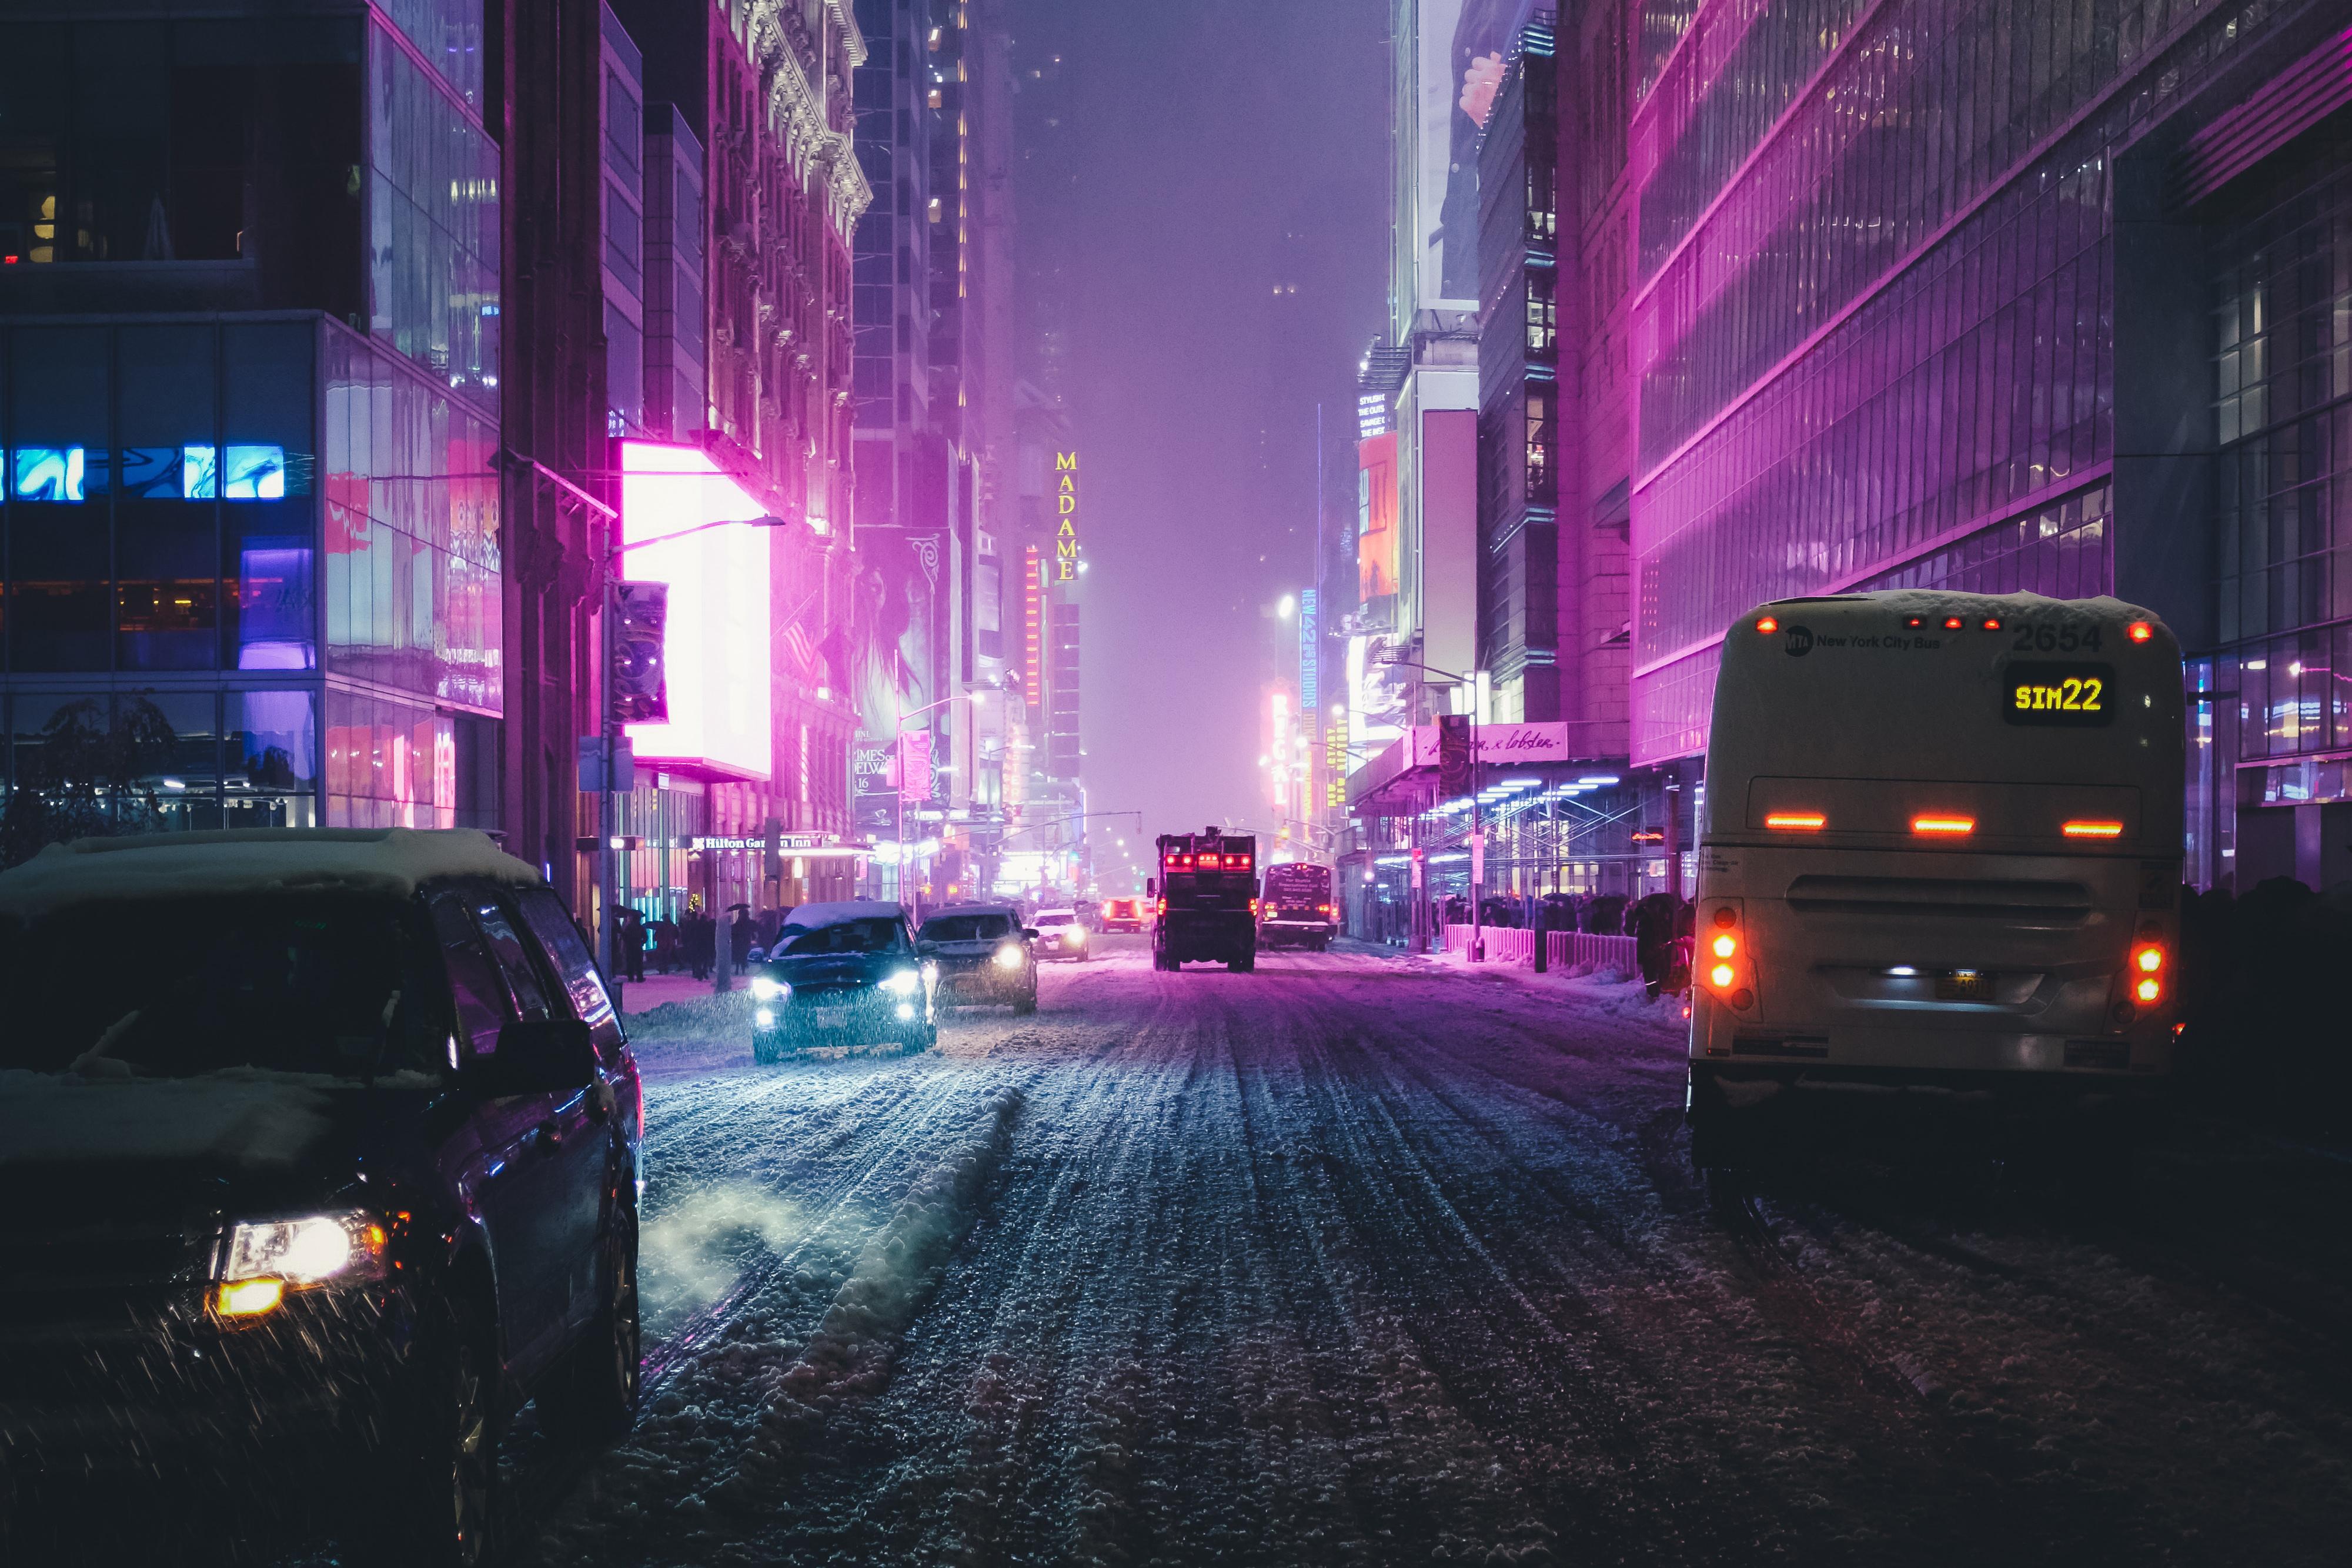 Night City Street Neon Lights 4k Hd Photography 4k